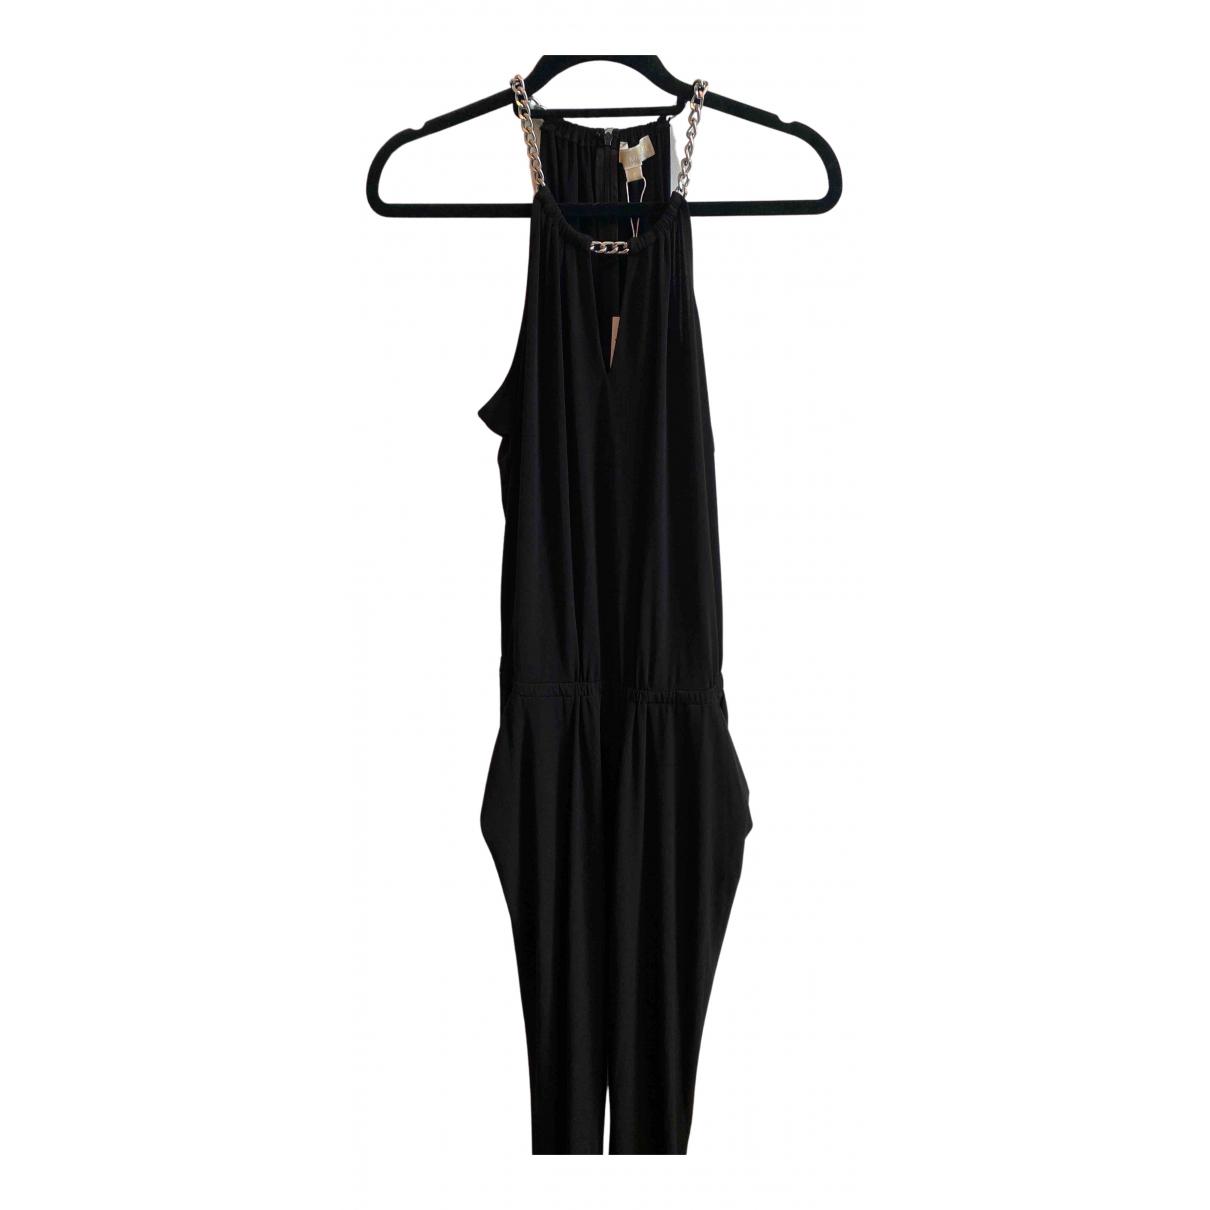 Michael Kors N Black jumpsuit for Women M International